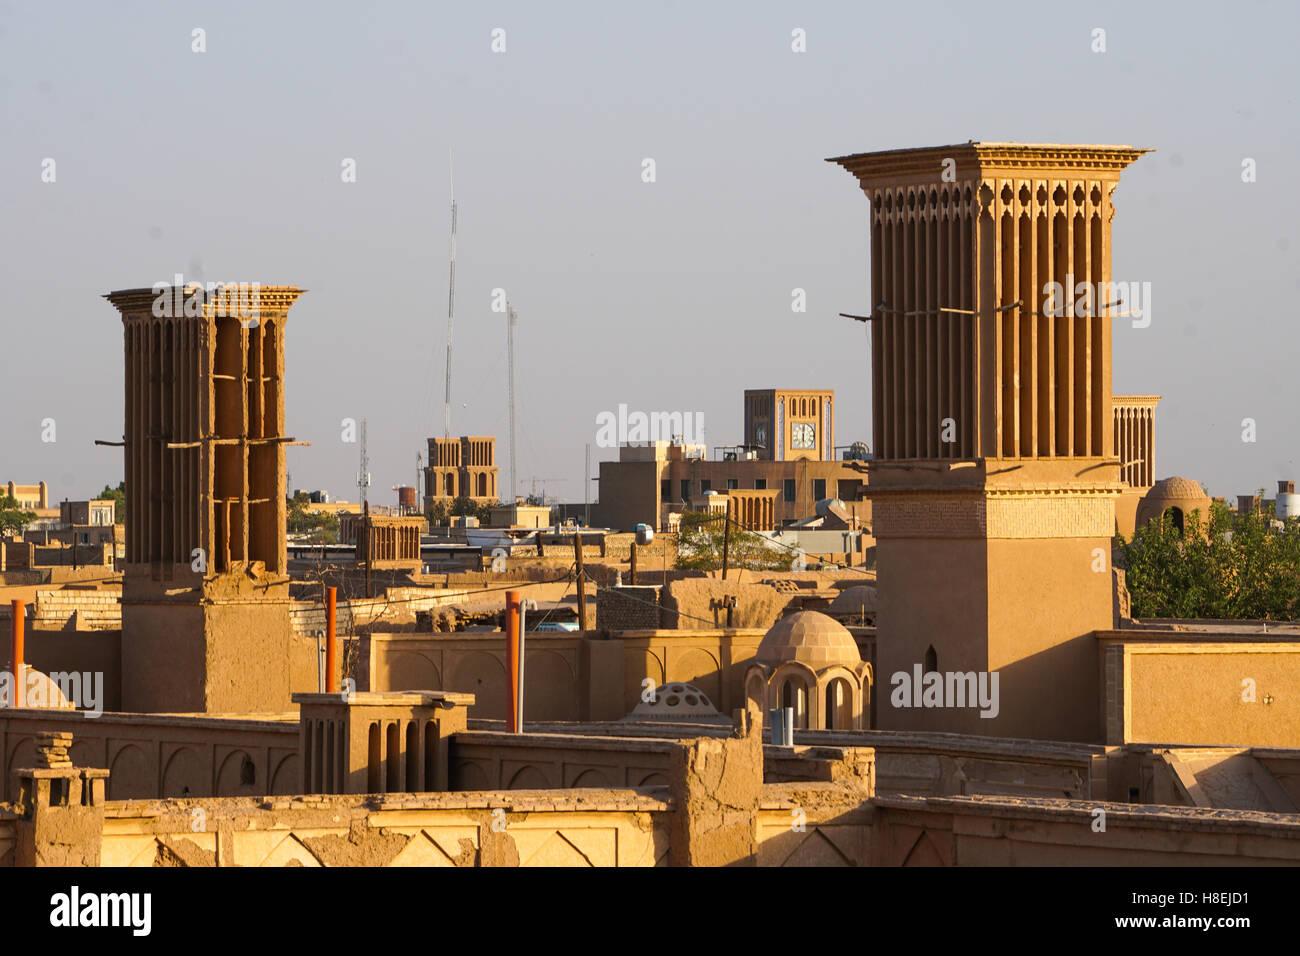 Cityscape at Dusk avec de nombreux windtowers (badgirs), Yazd, Iran, Moyen-Orient Photo Stock